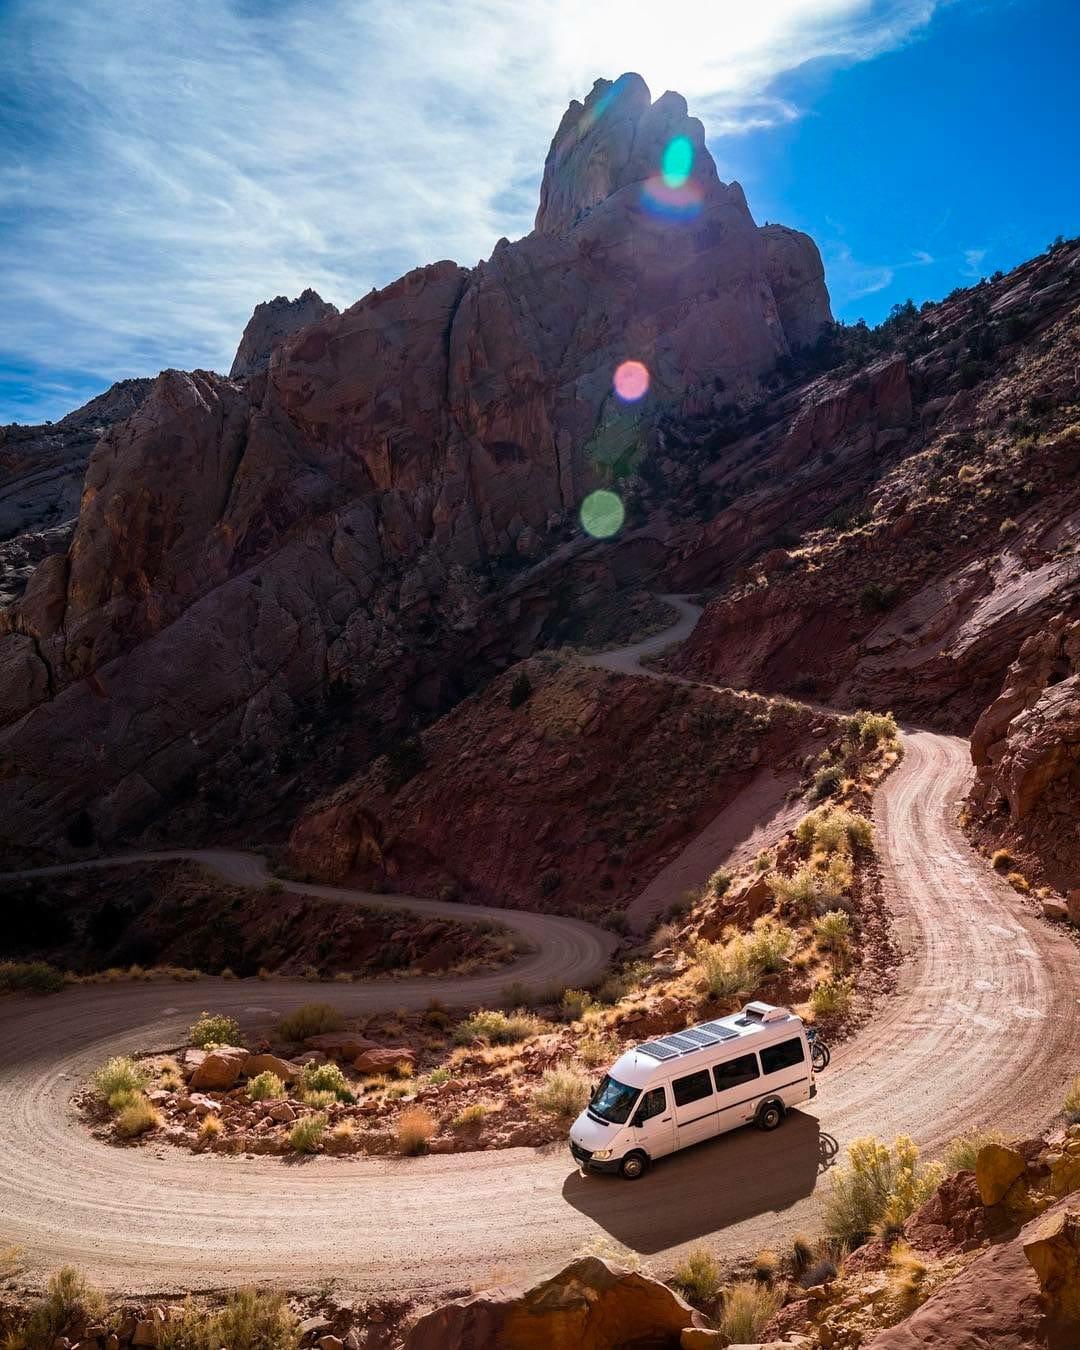 Converted mercedes sprinter van driving in the desert